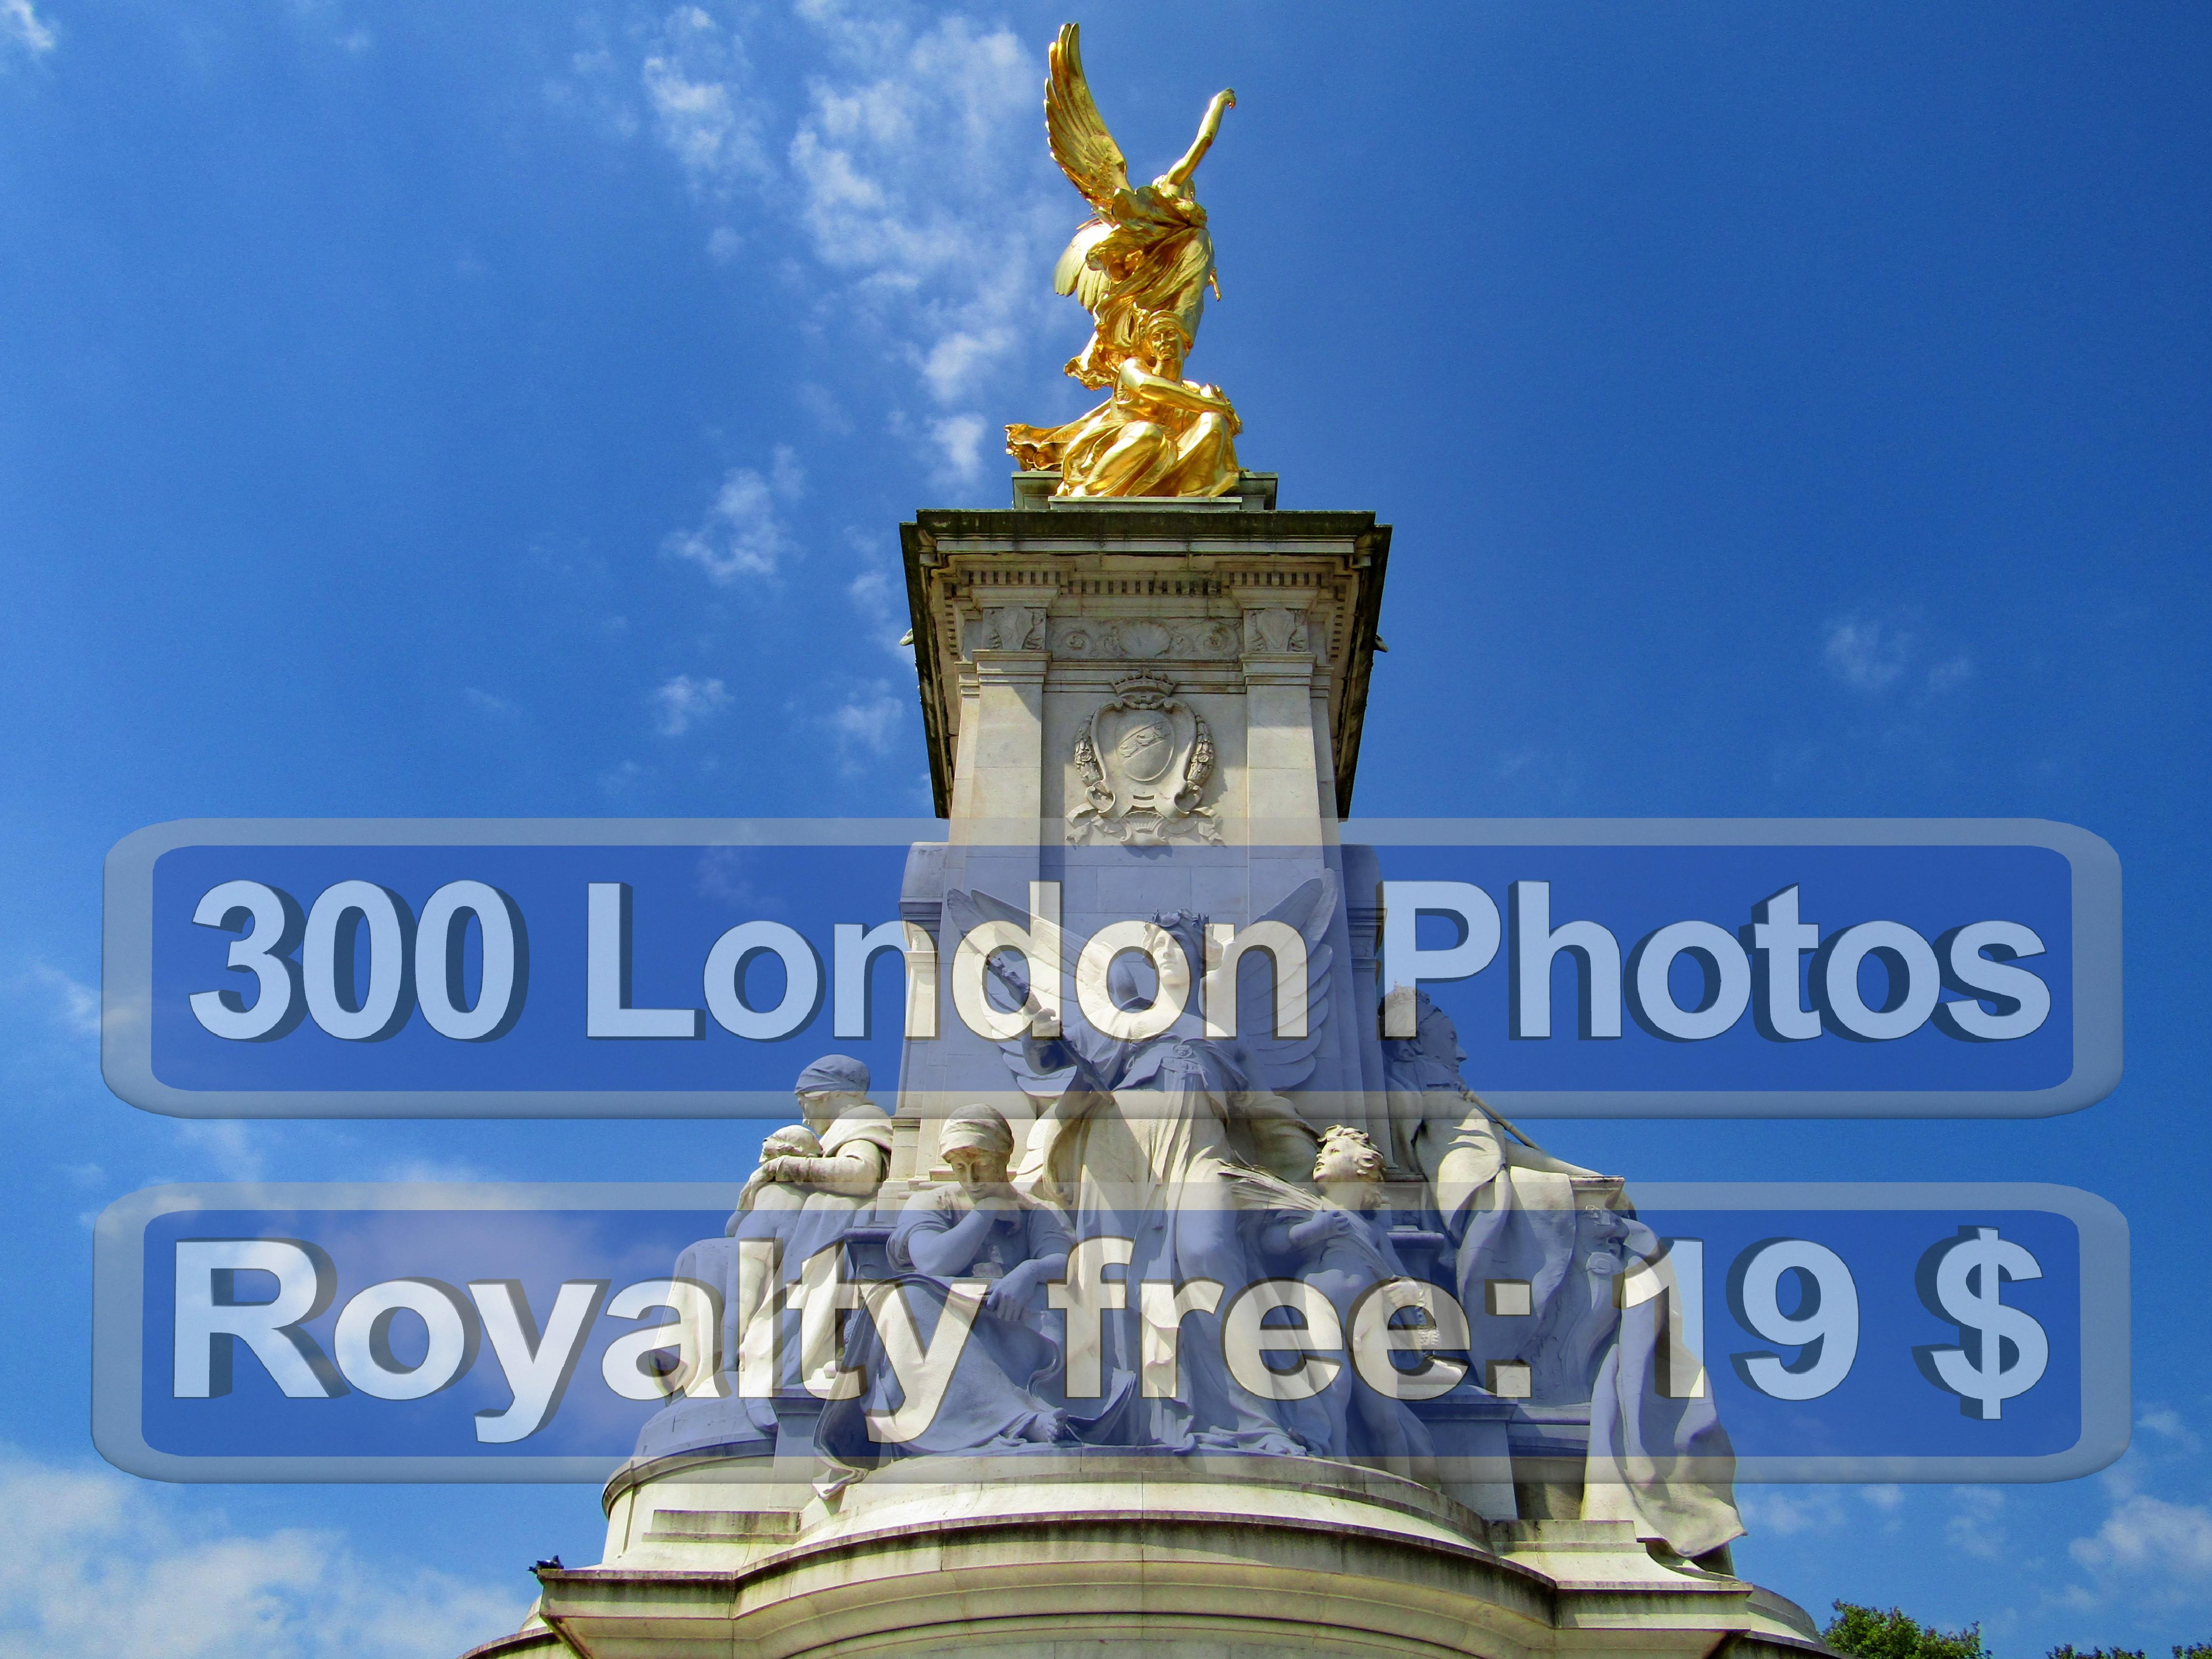 L'etape London Photos